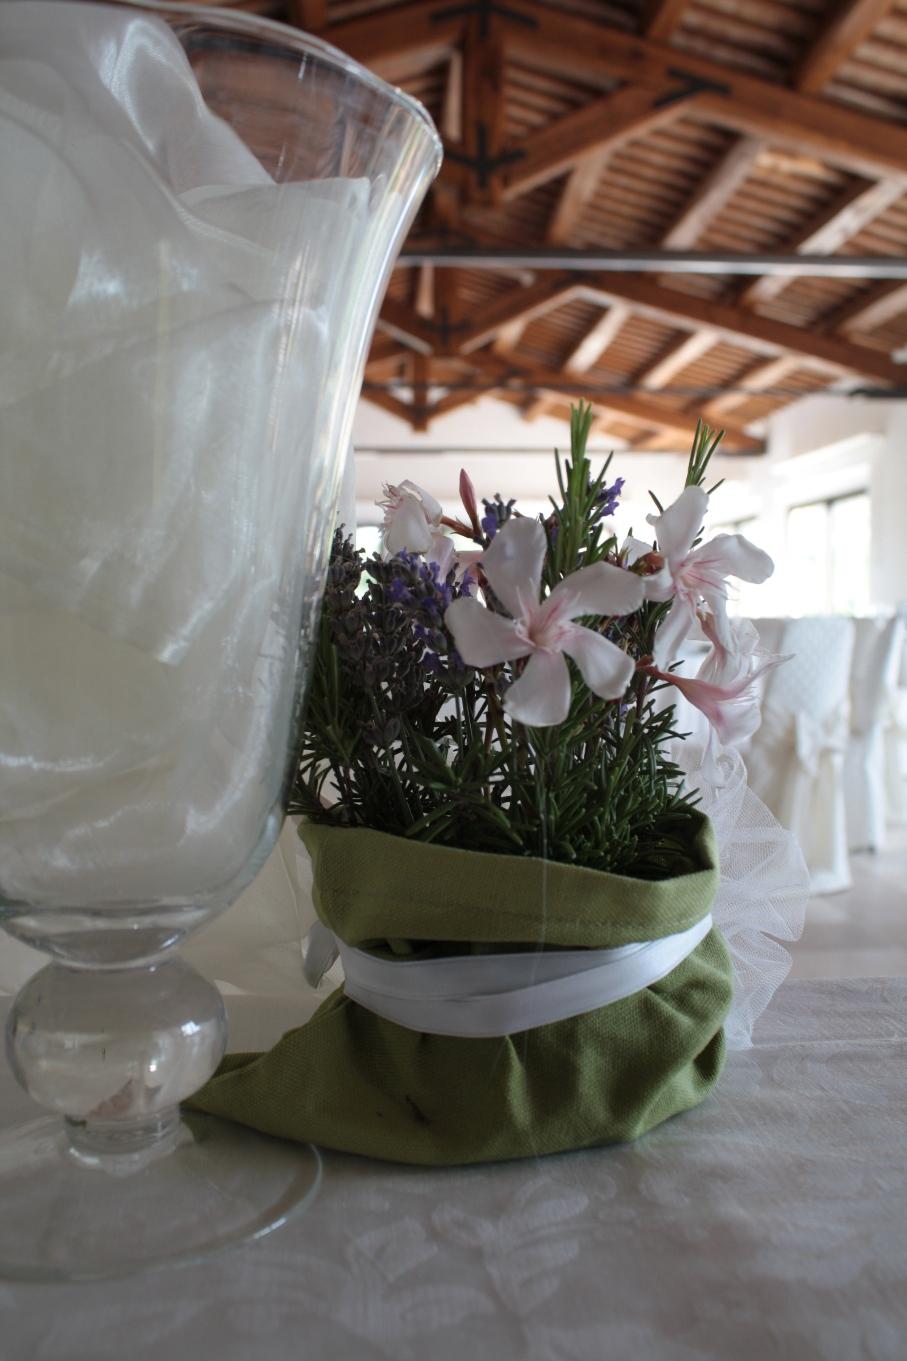 Matrimonio Vigneto Toscana : Matrimonio ecologico l eco chic wedding nella stupenda